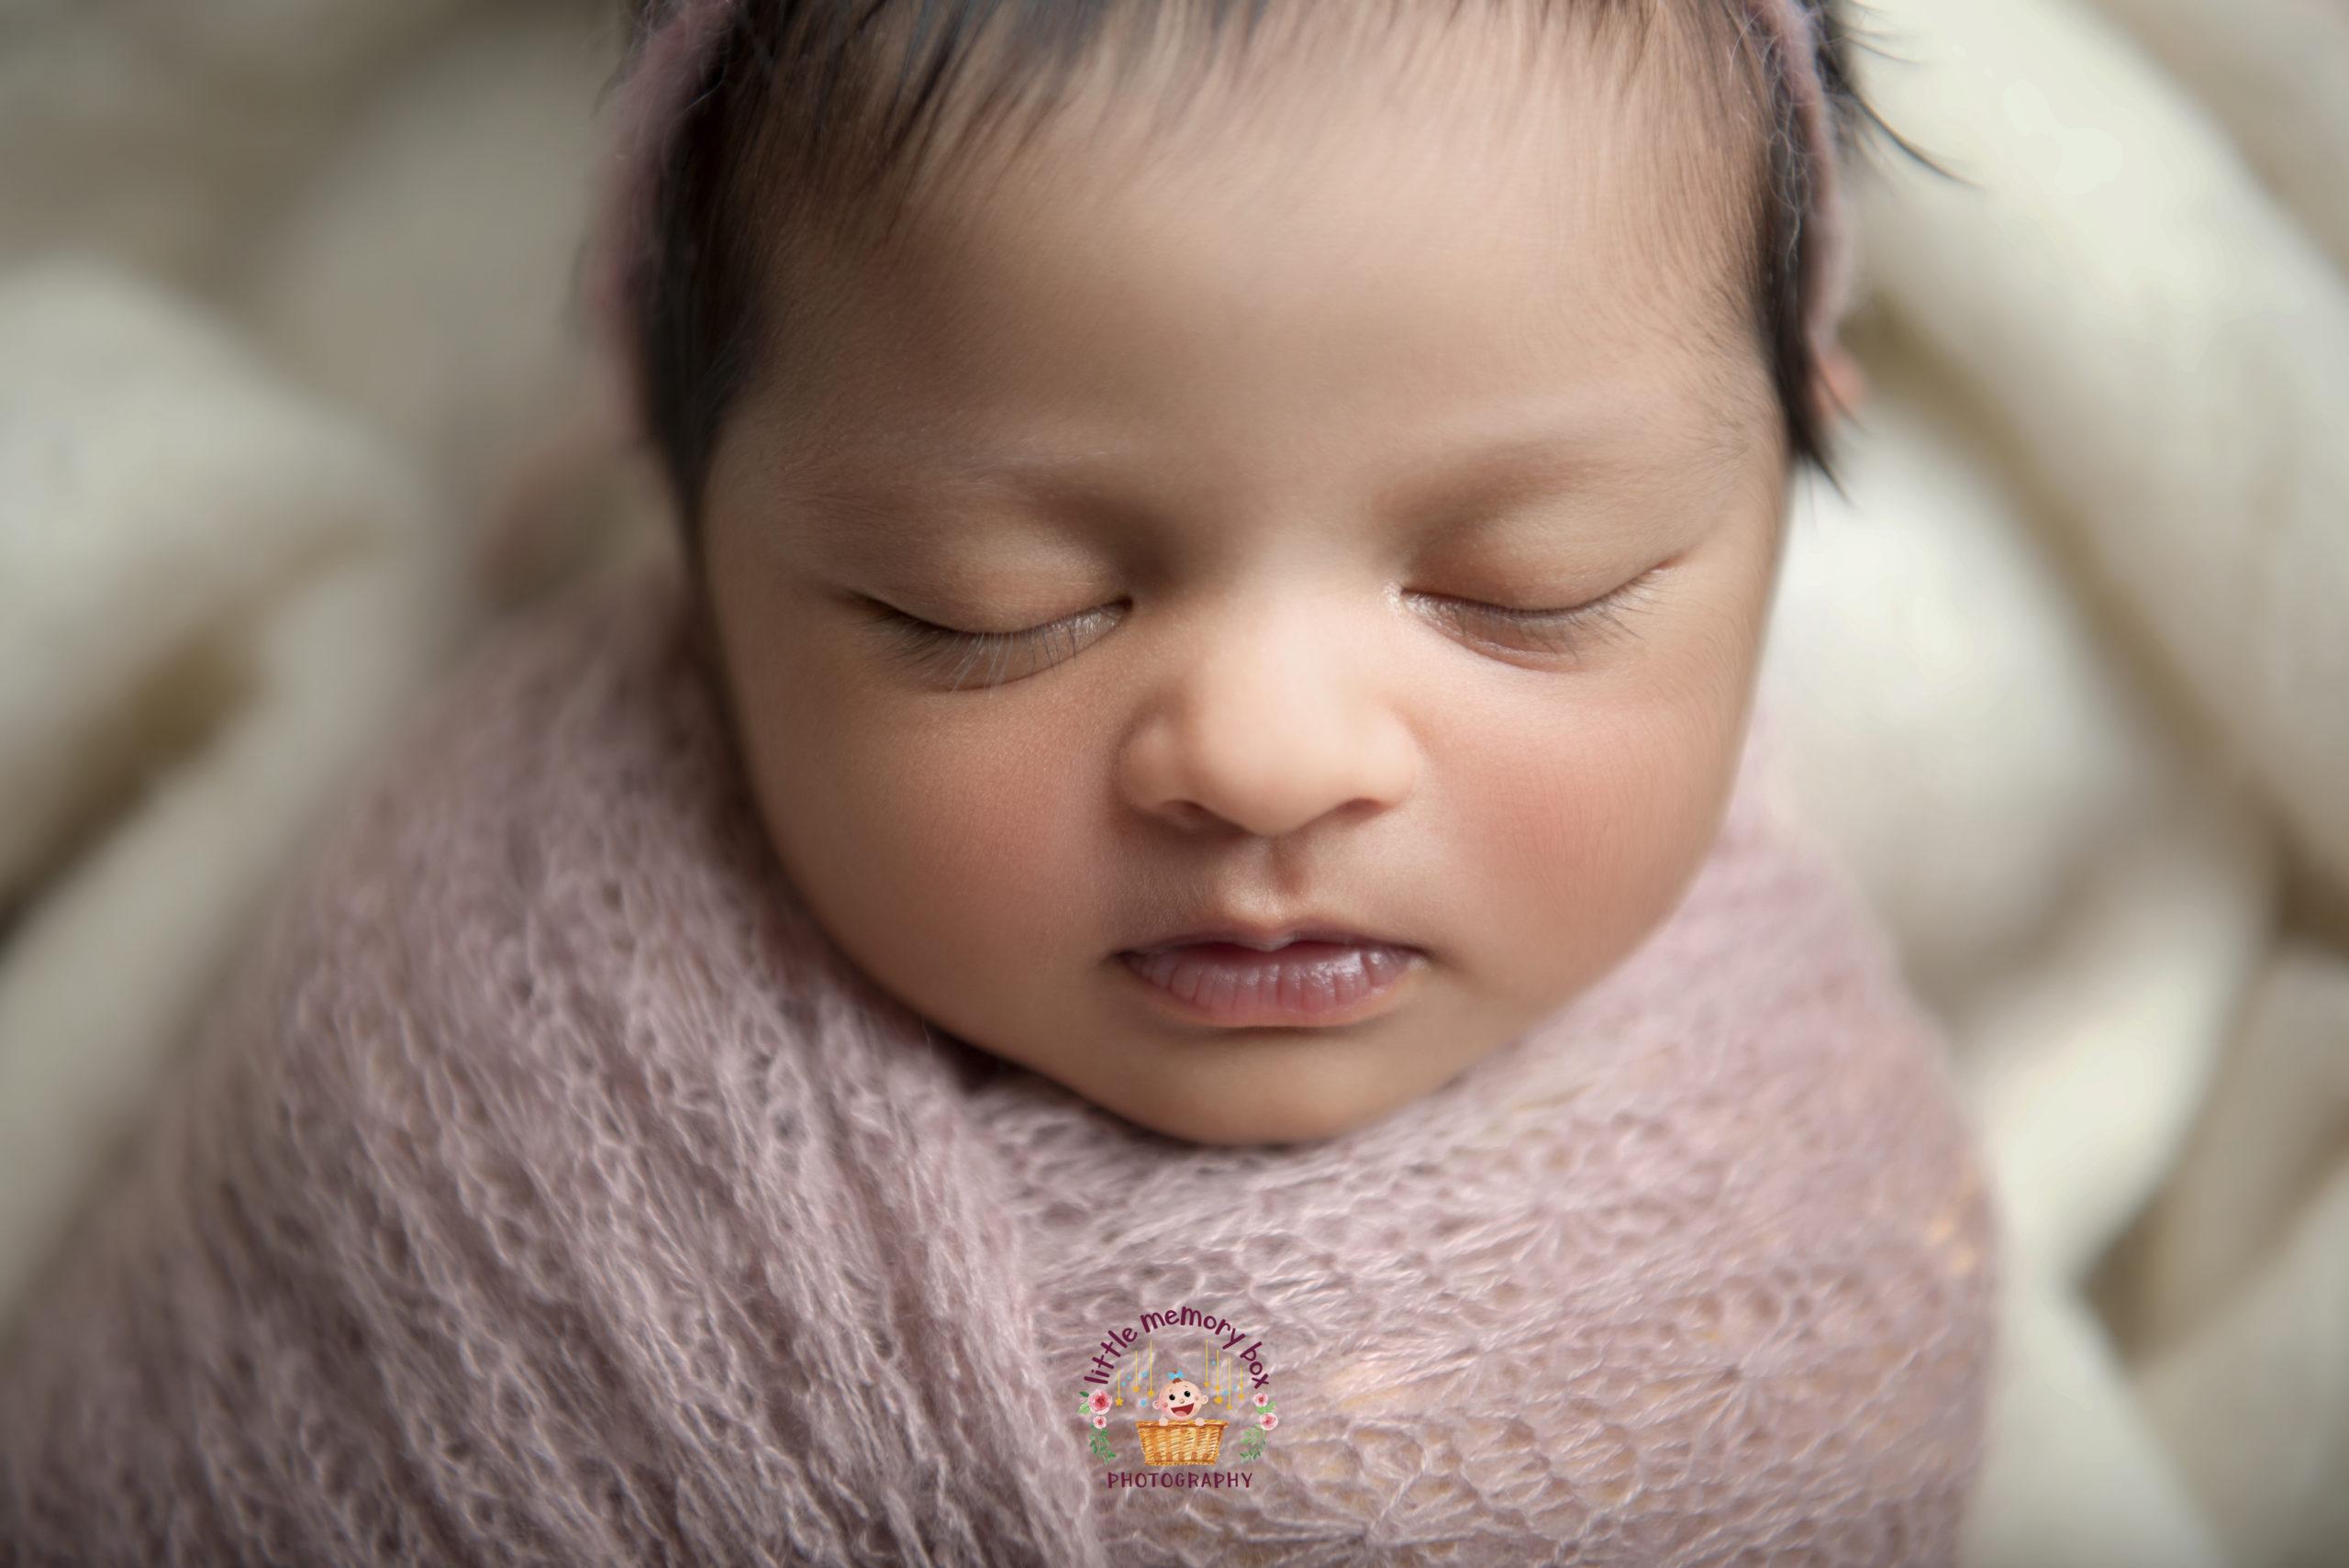 closeup of newborn baby face